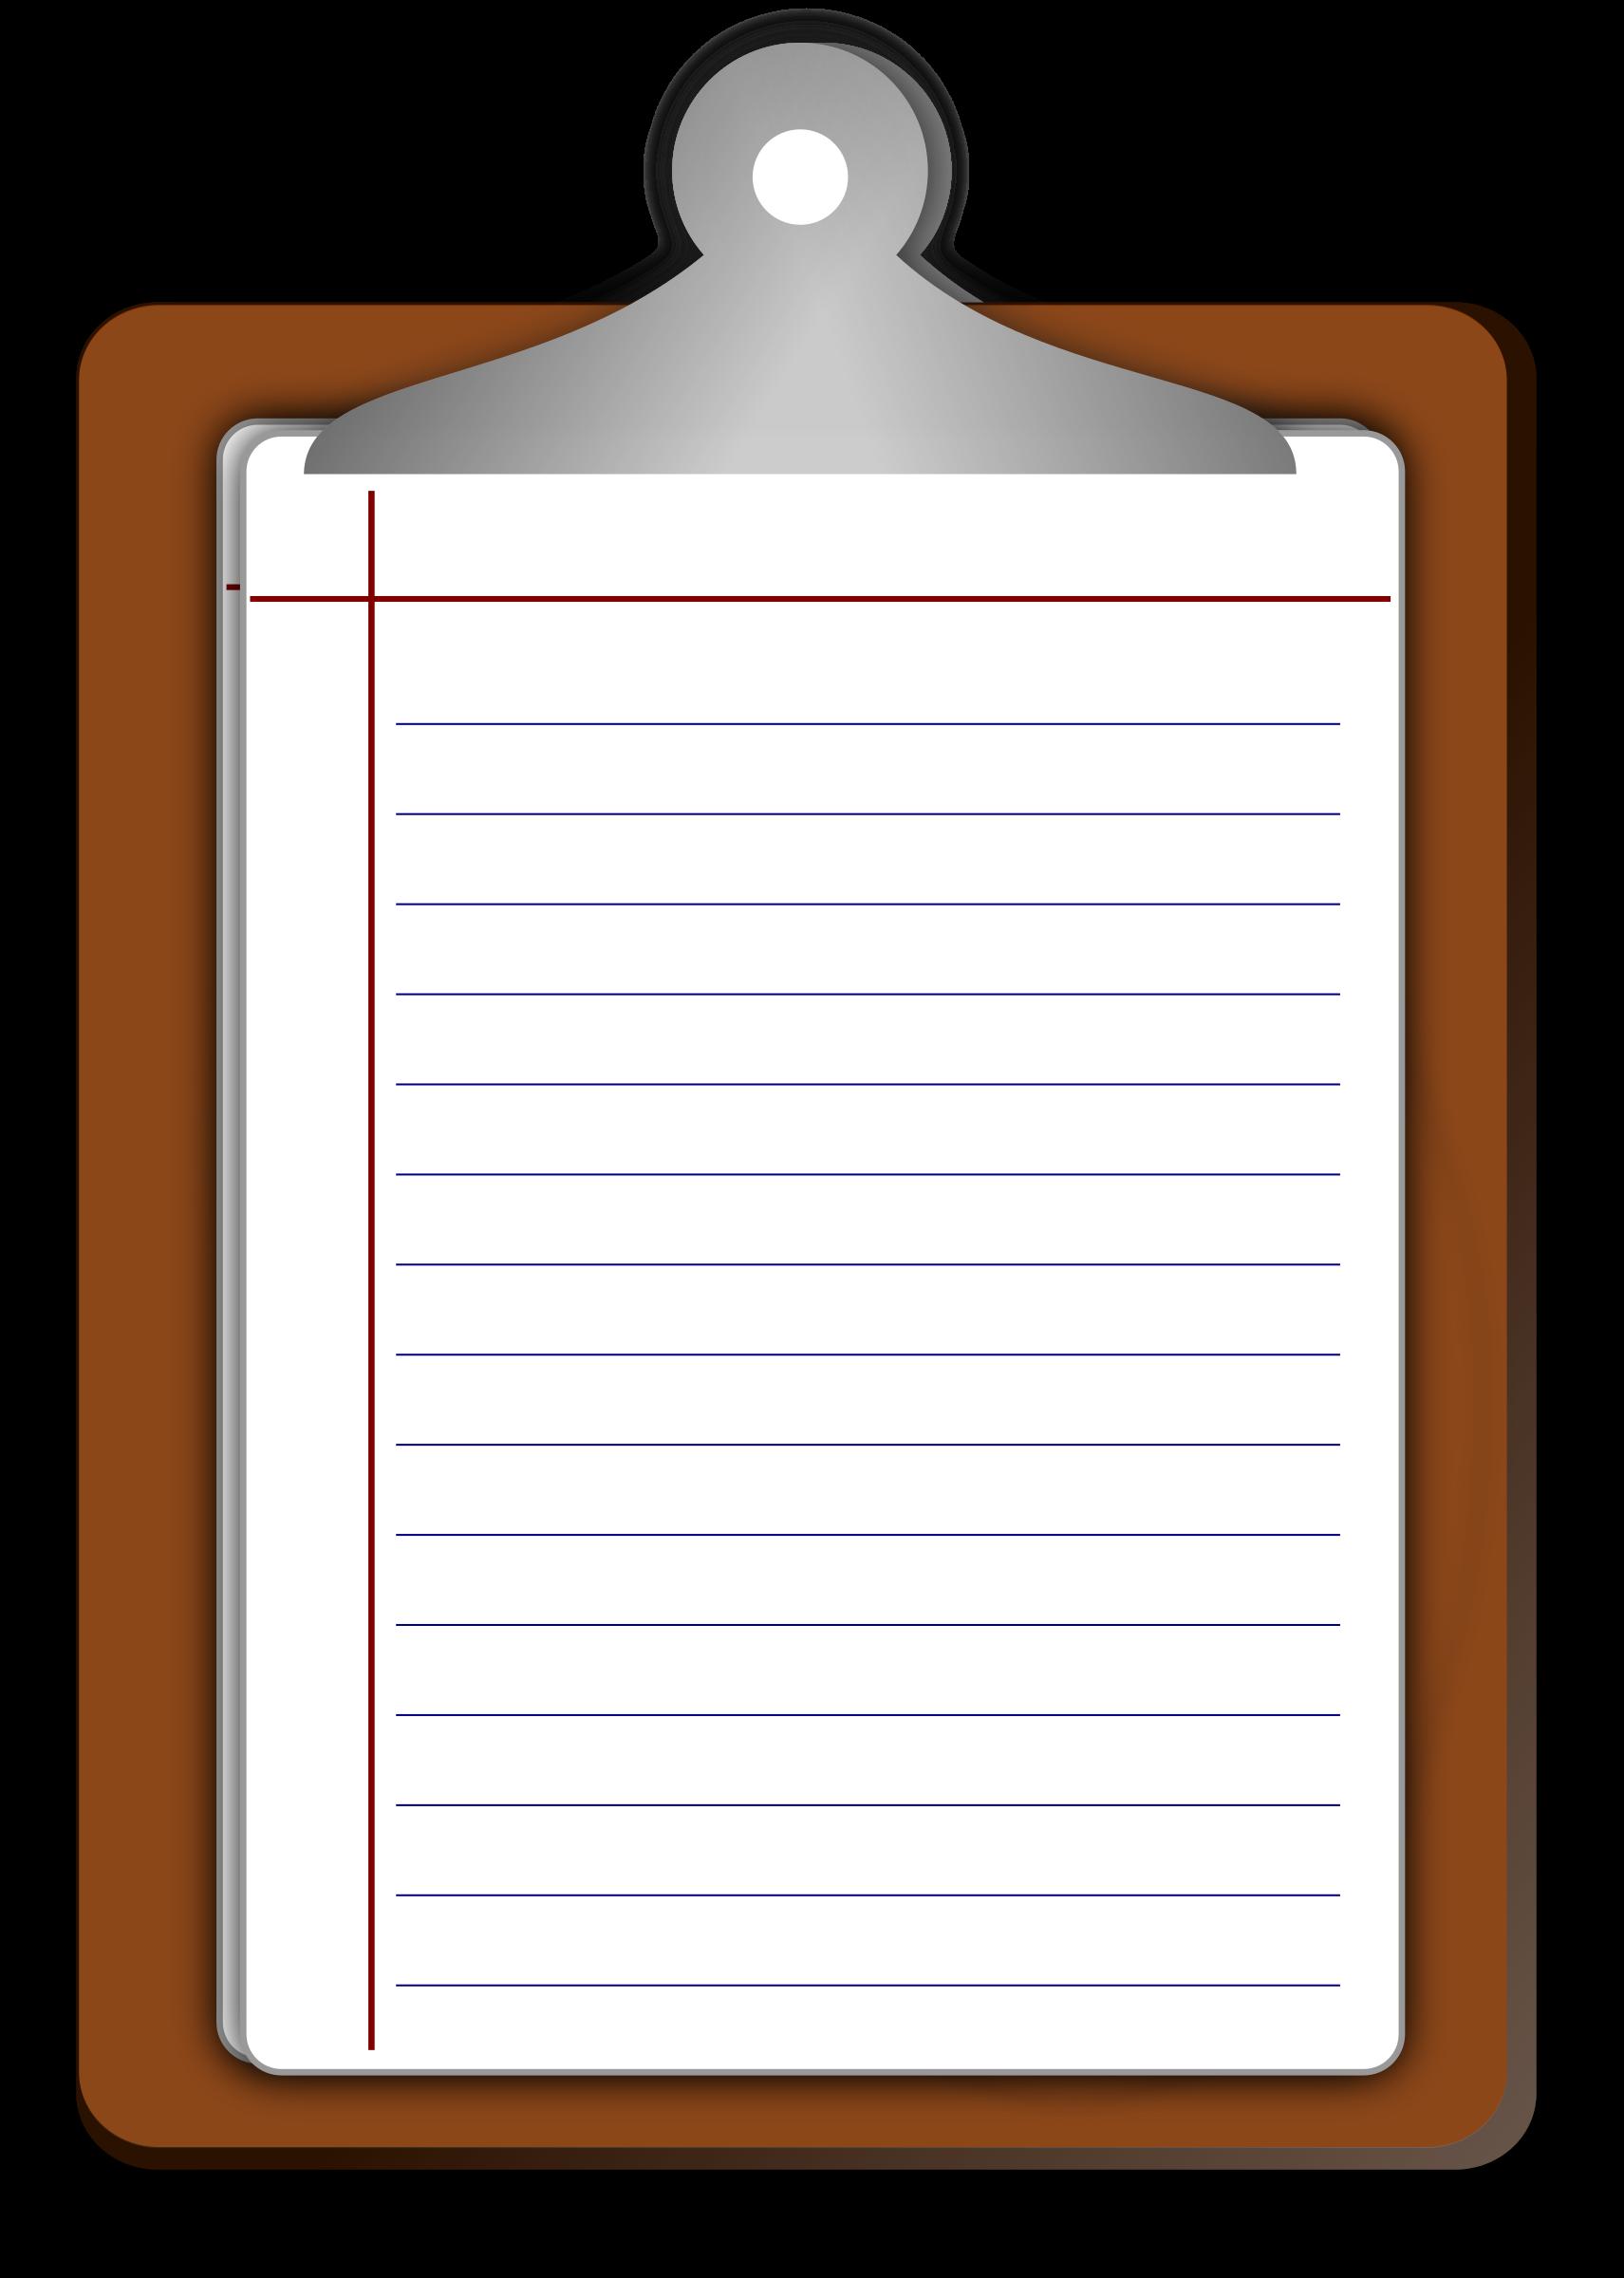 Clipart writing writing journal. Pad big image png